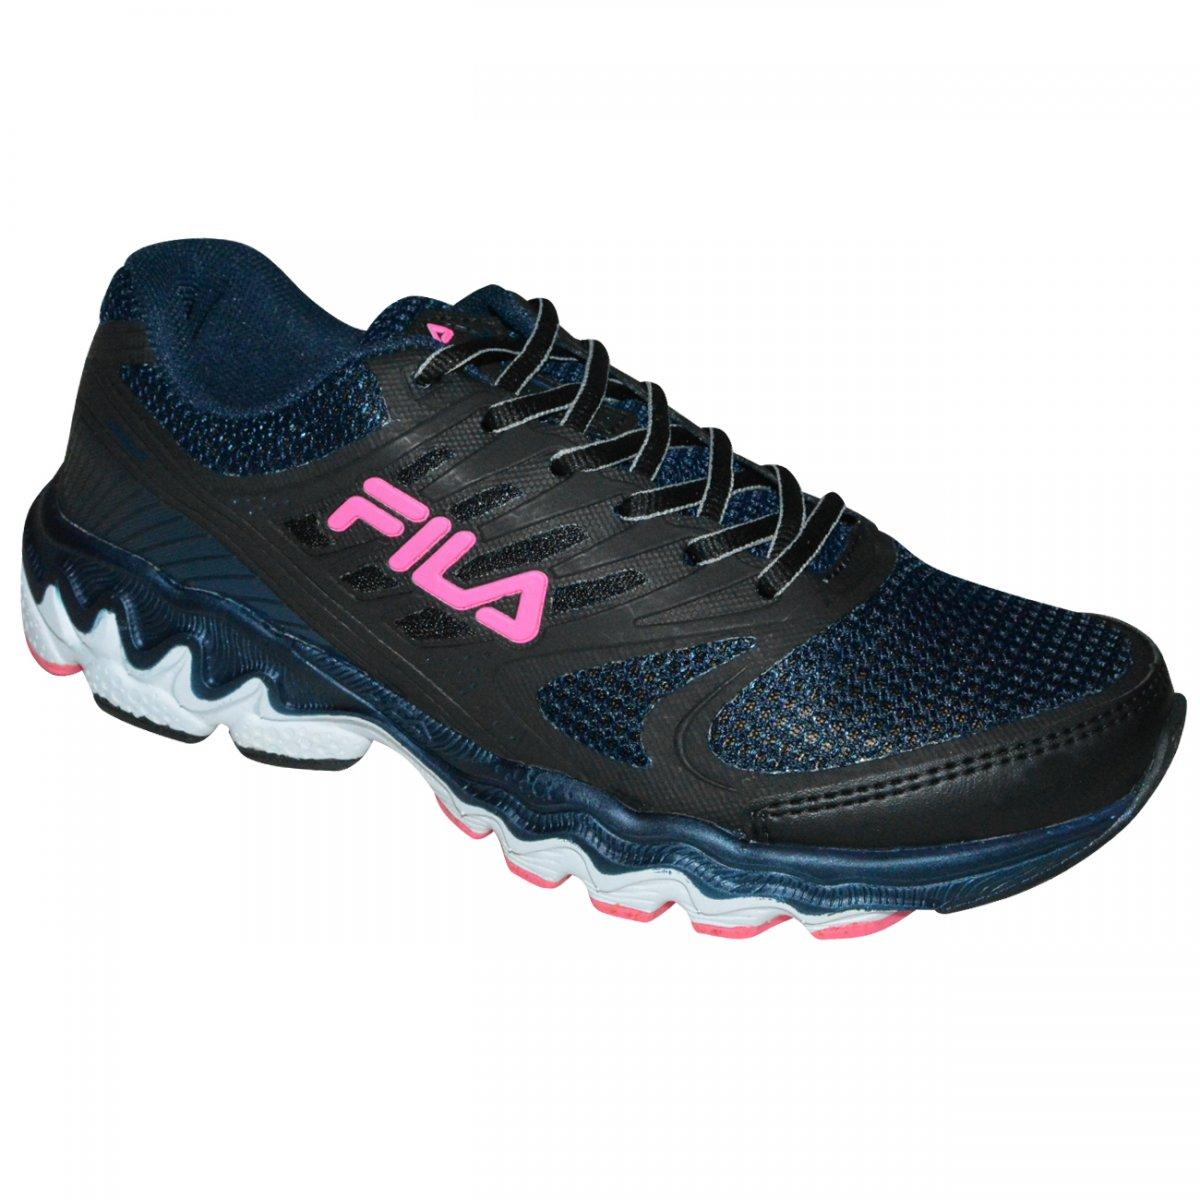 00393e776b5 Tenis Fila Viper 683140 - Marinho Preto Rosa - Chuteira Nike